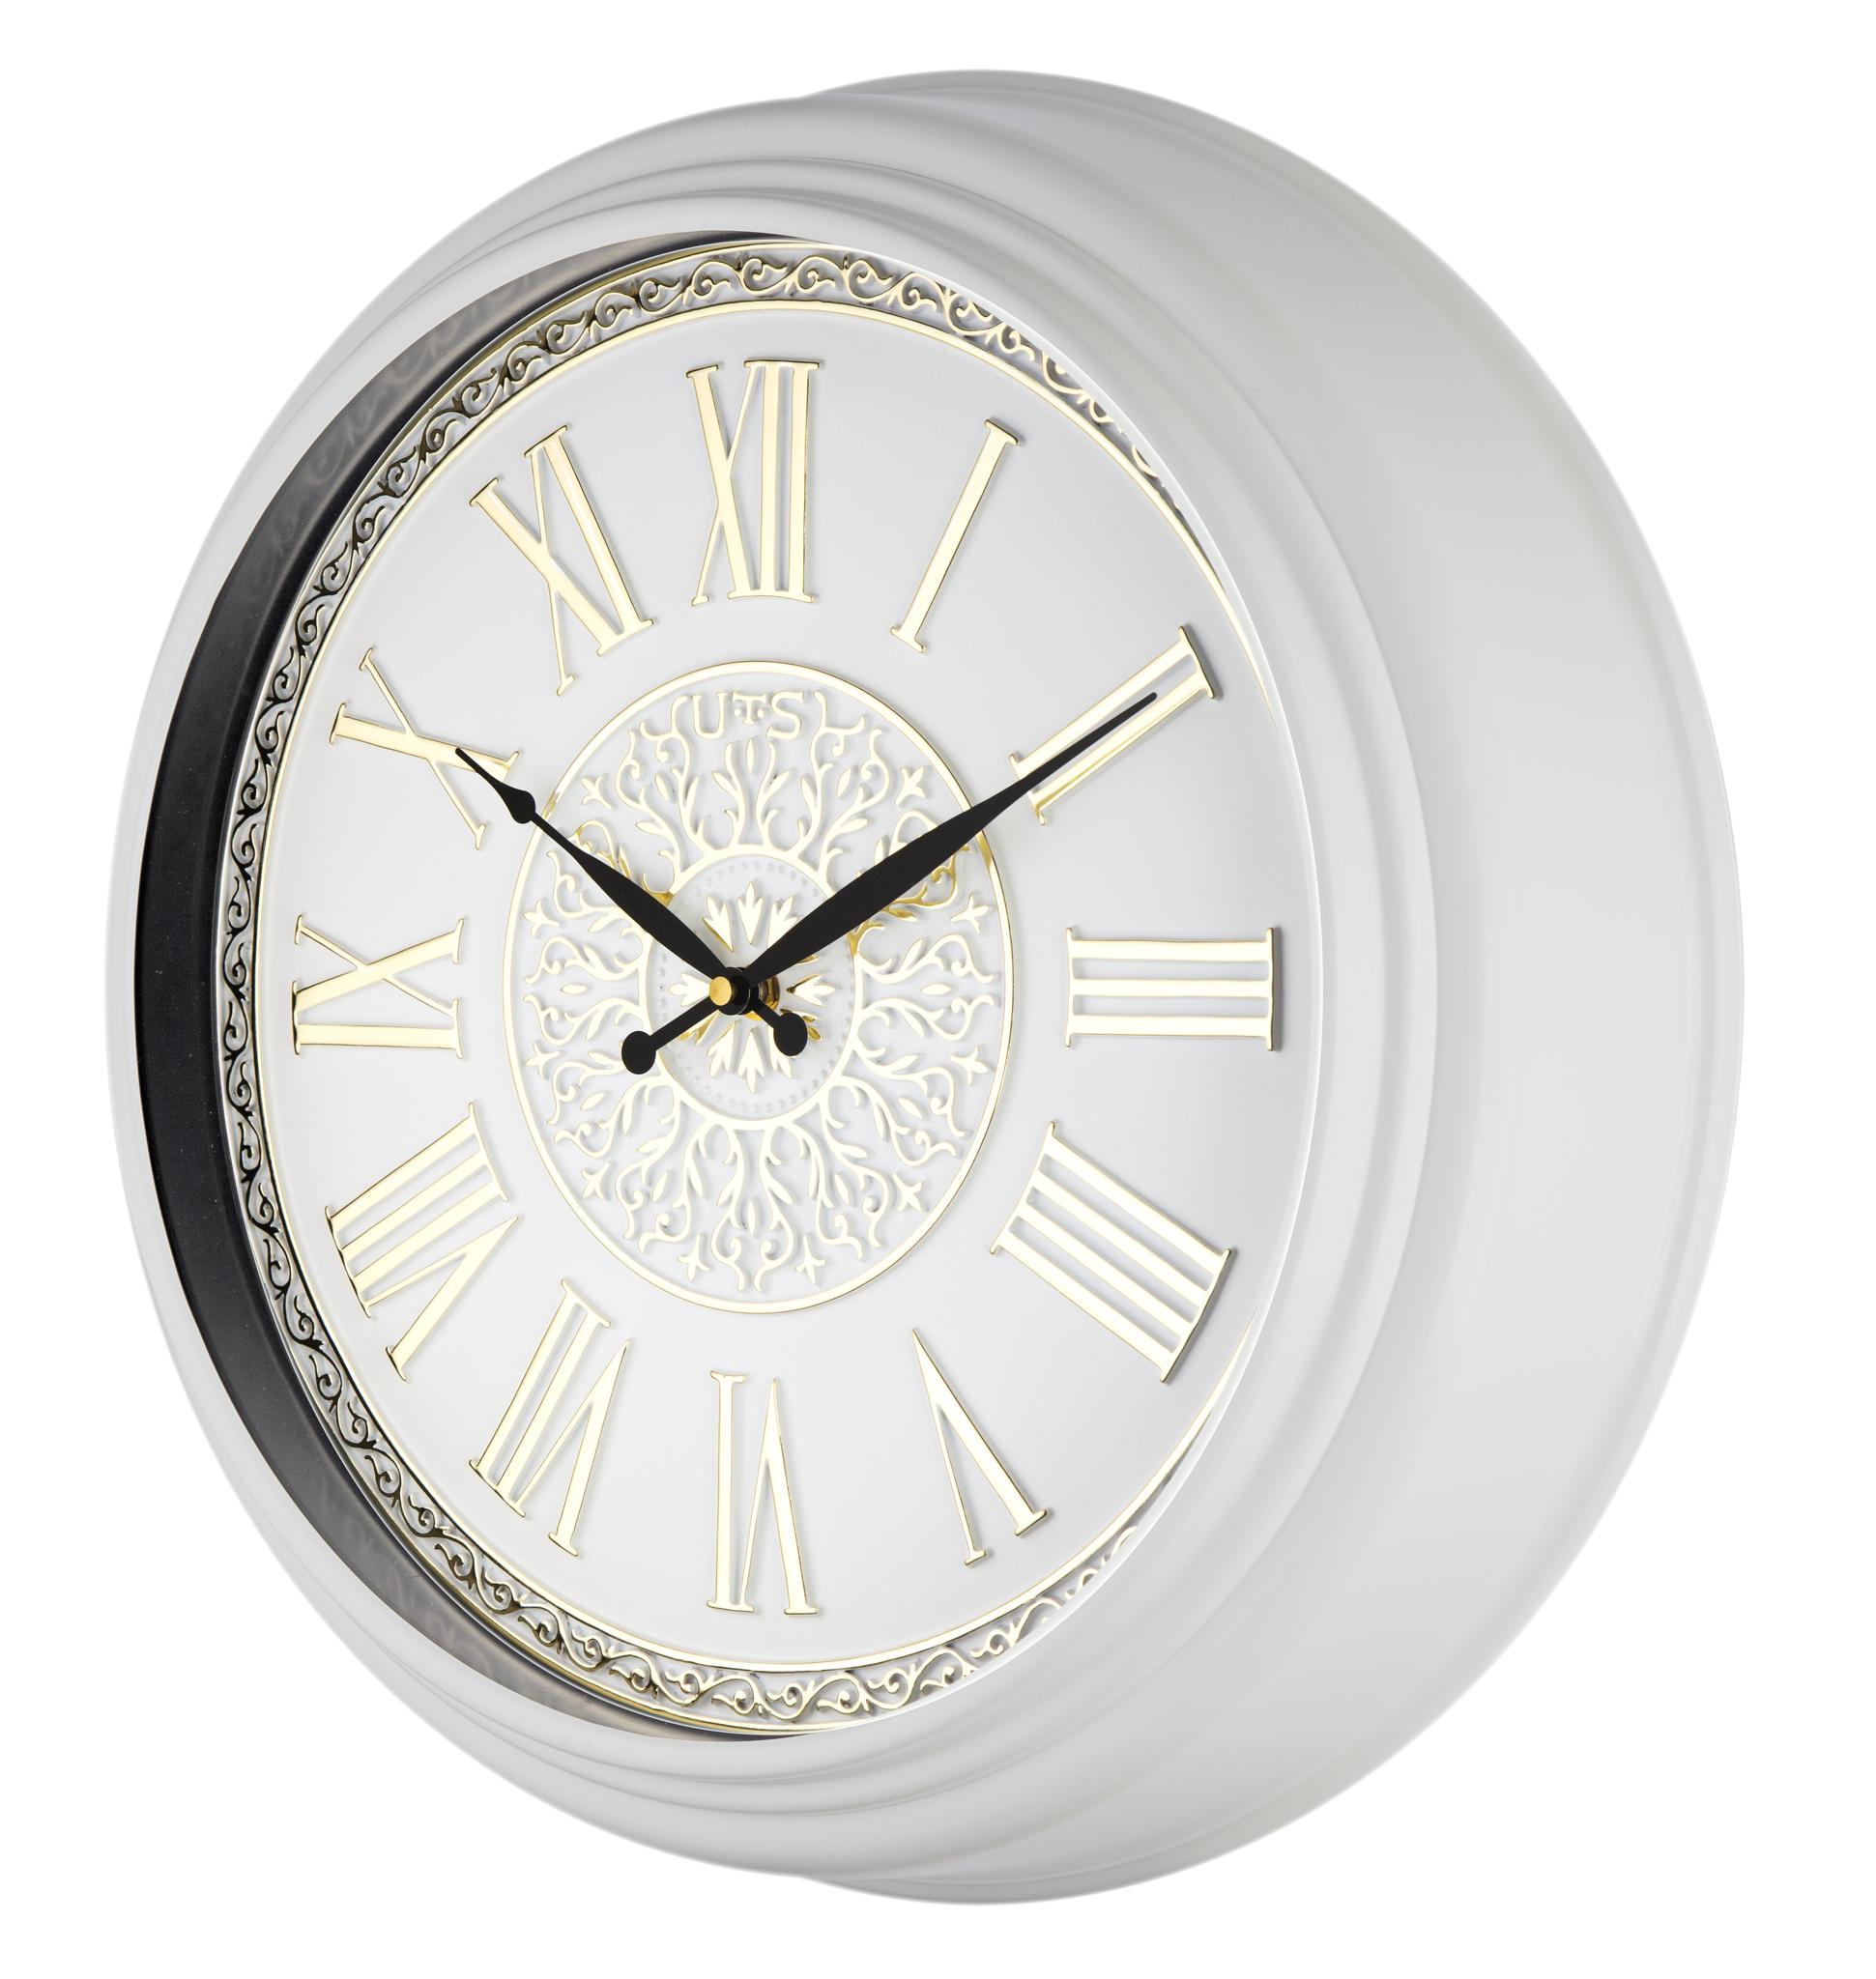 Часы настенные Часы настенные Tomas Stern 9039 chasy-nastennye-tomas-stern-9039-germaniya.jpg